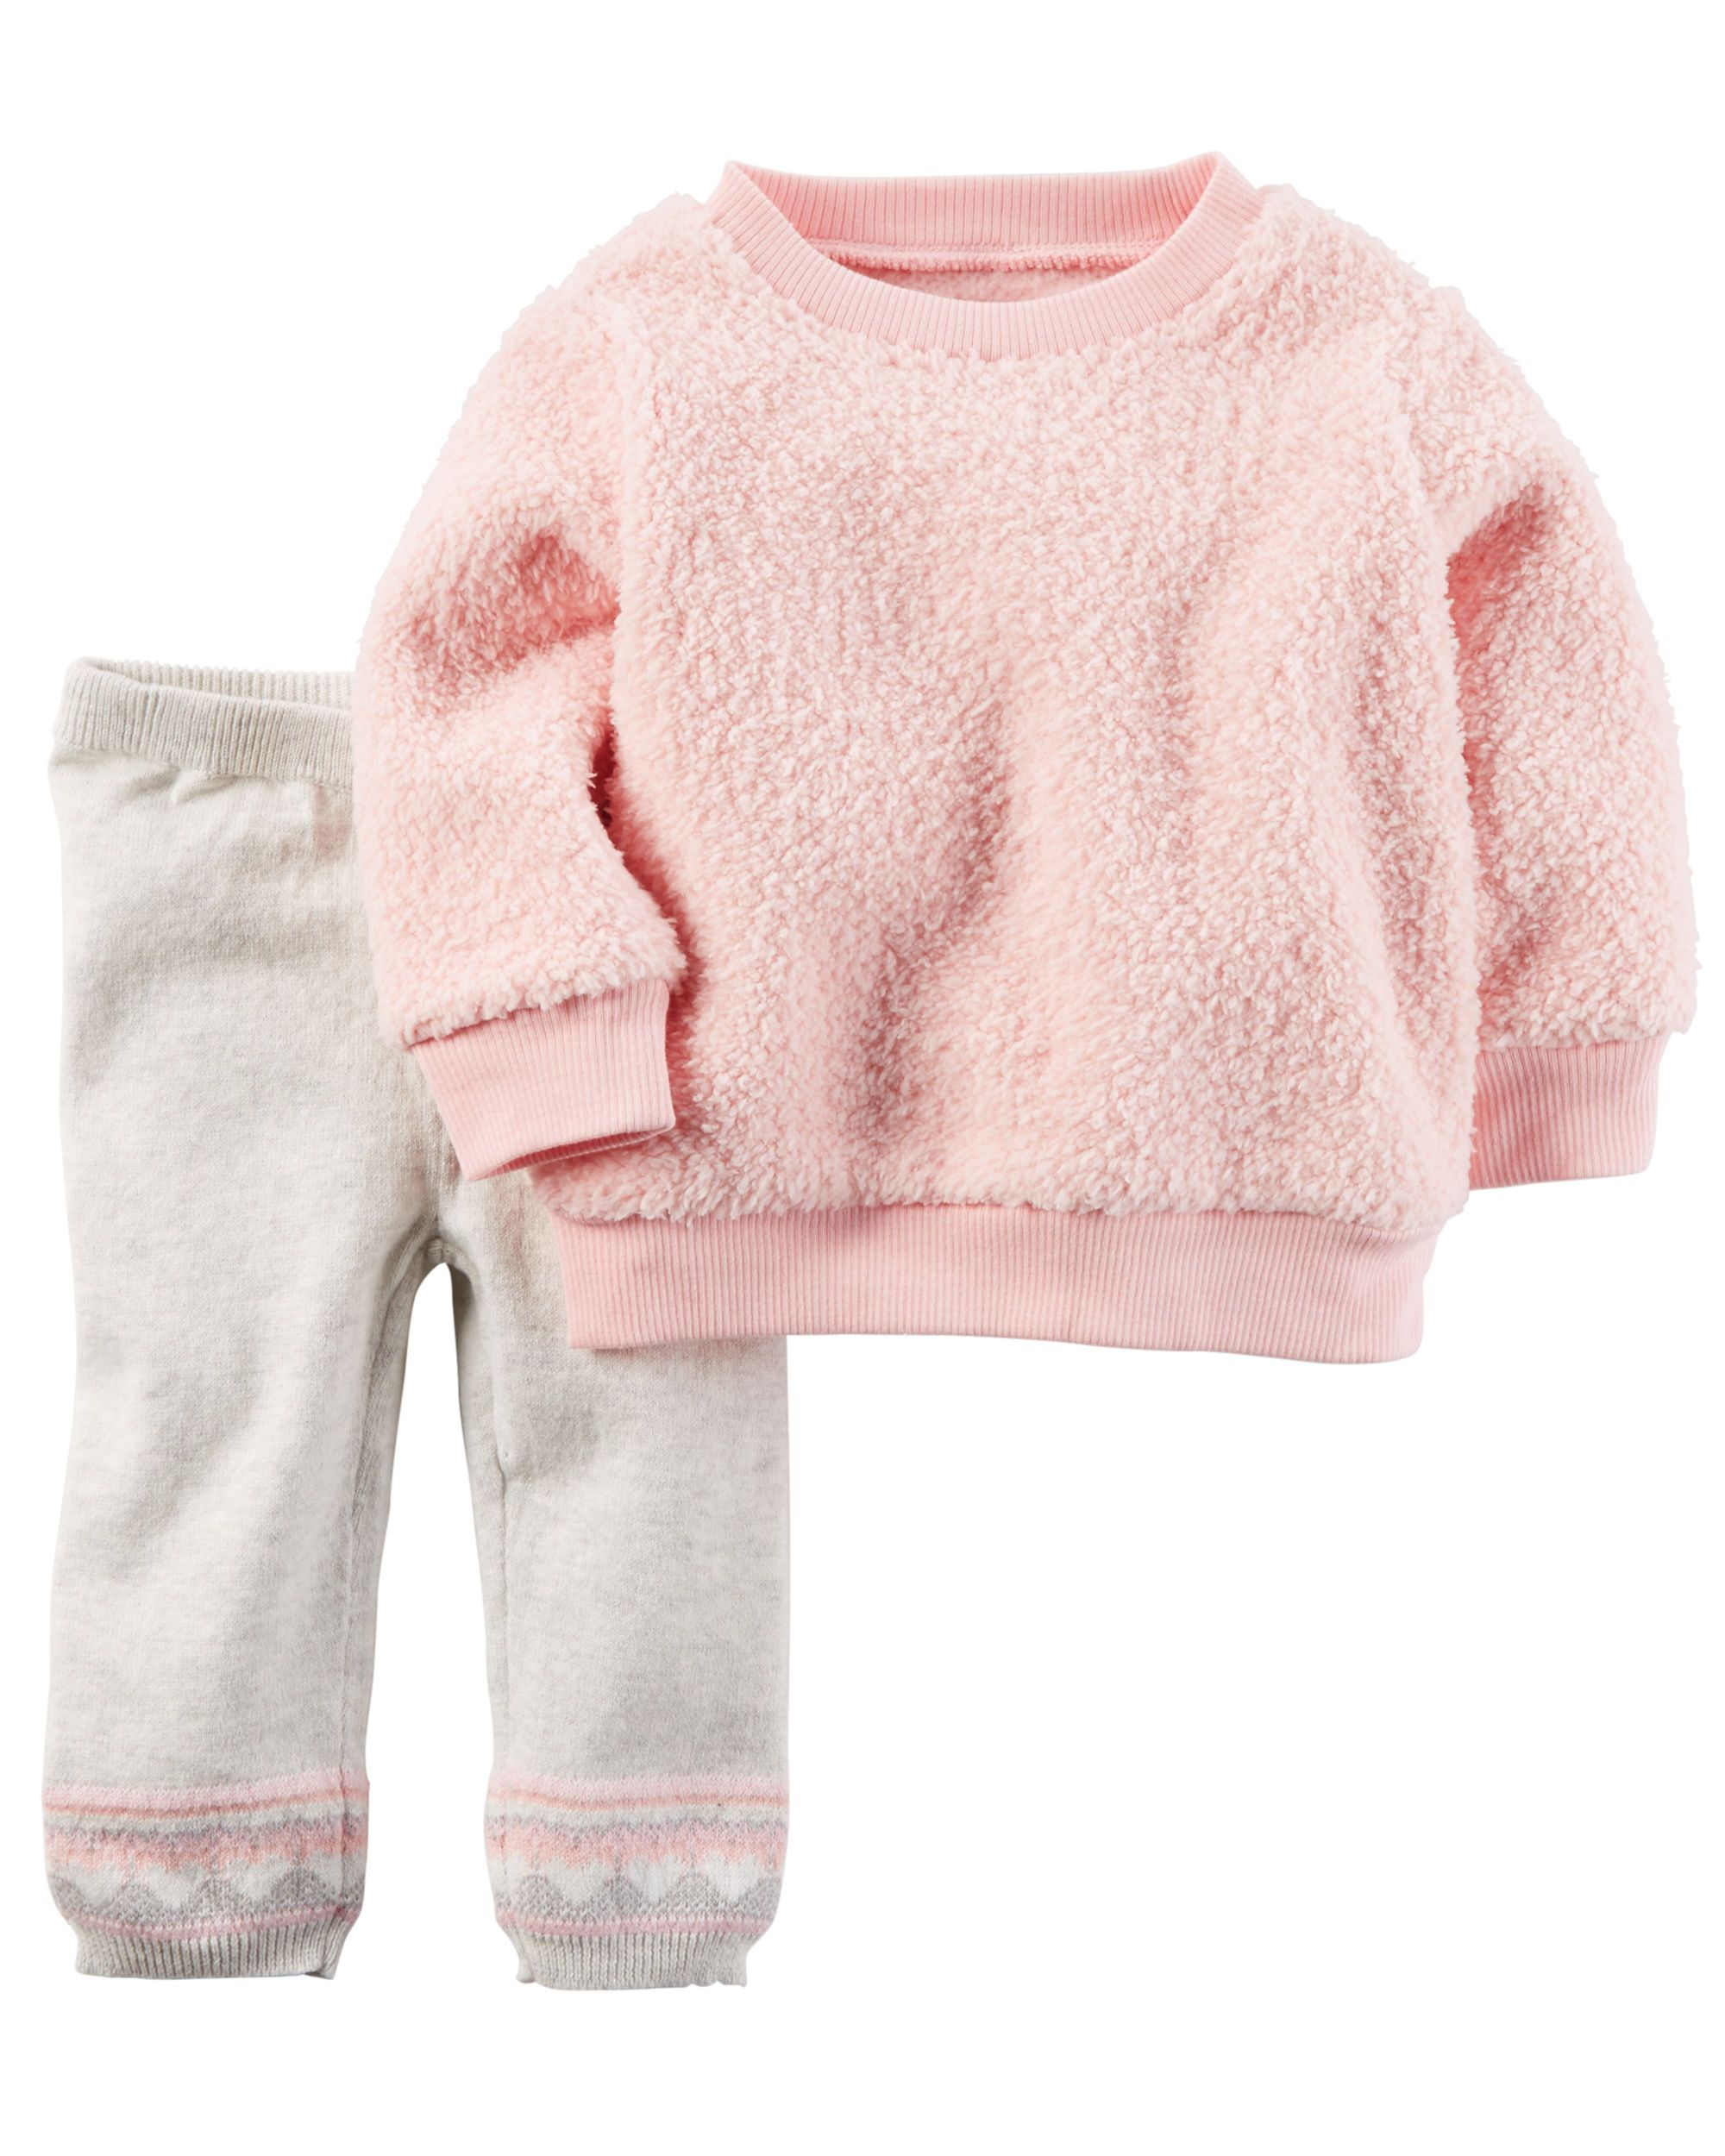 Carters Girls Toddler Sweater